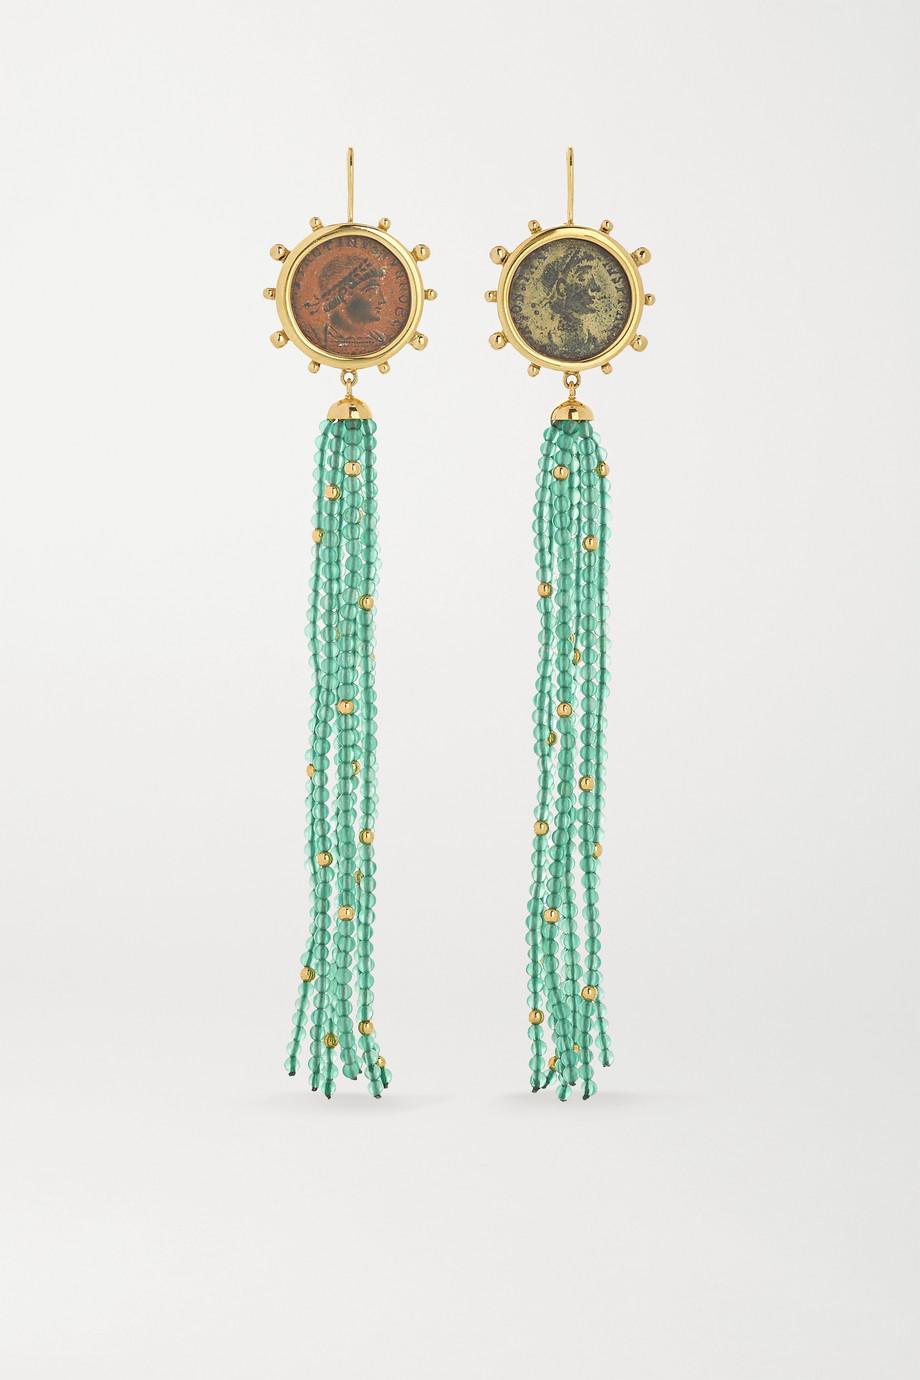 Dubini Constantine 18-karat gold, bronze and agate earrings